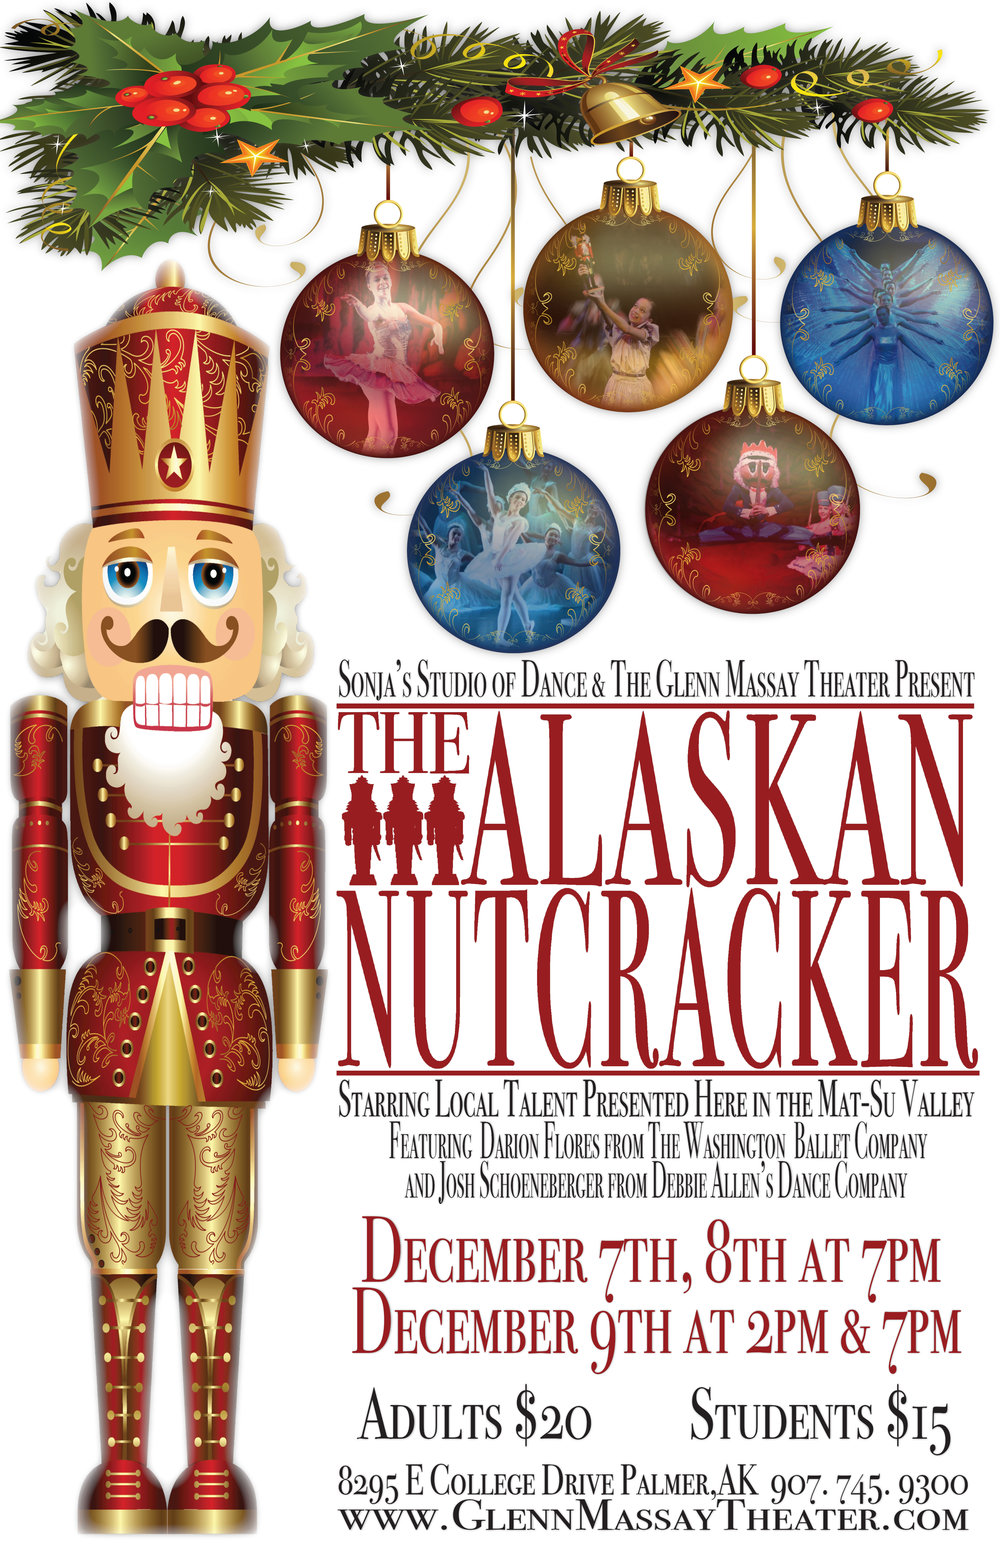 MAS - The Alaskan Nutcracker Here In The Mat-Su Valley!.jpg